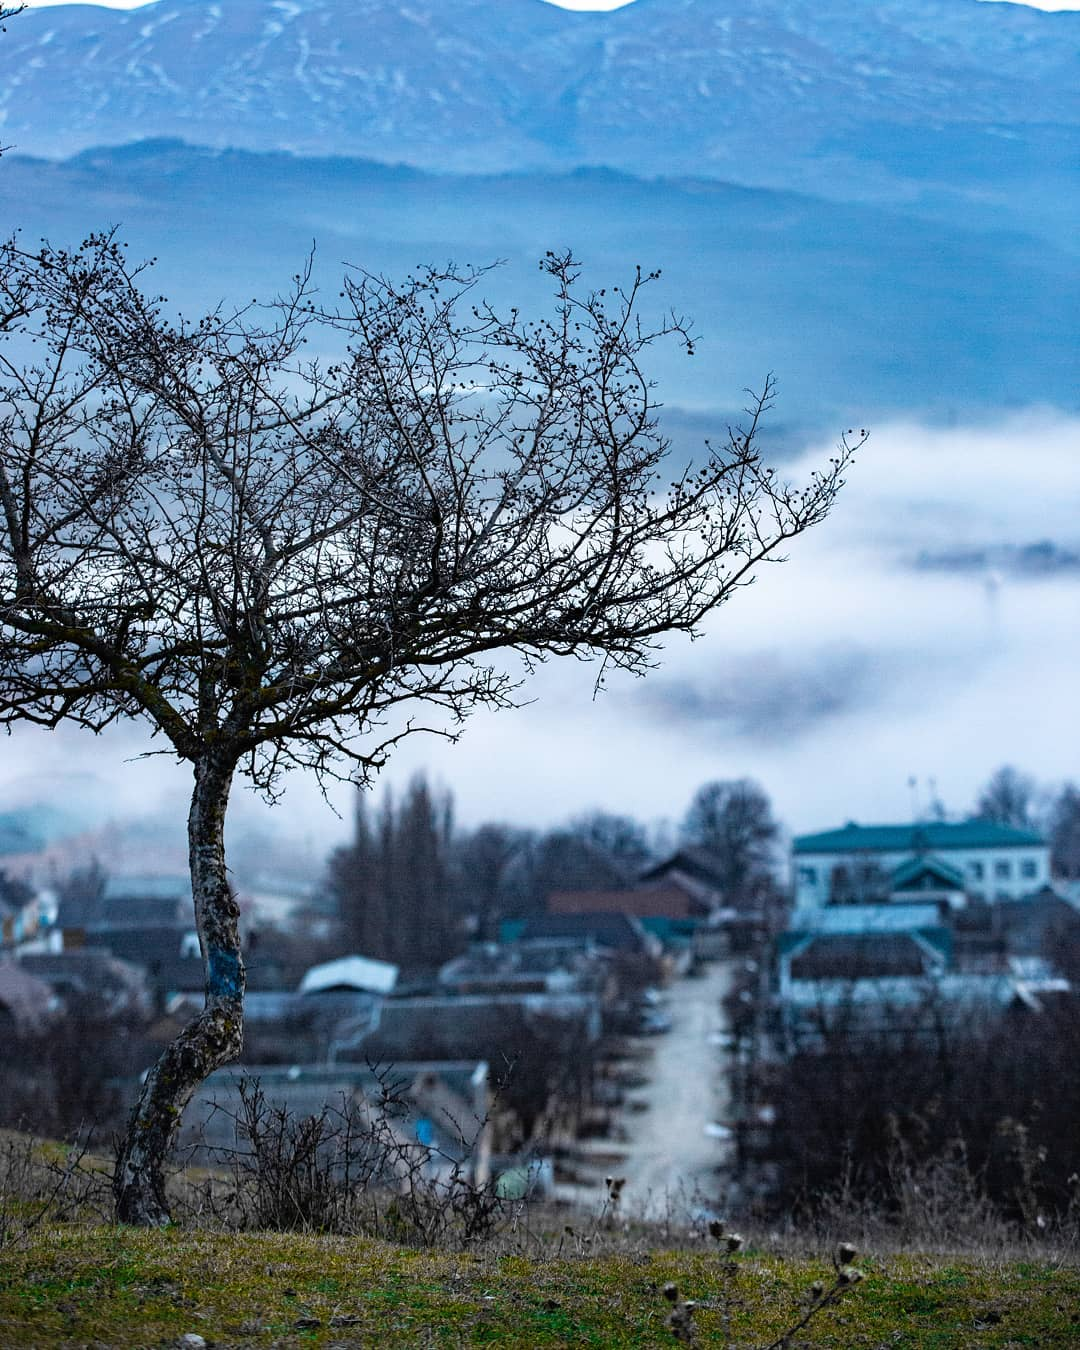 Дагестан. Аул в тумане.